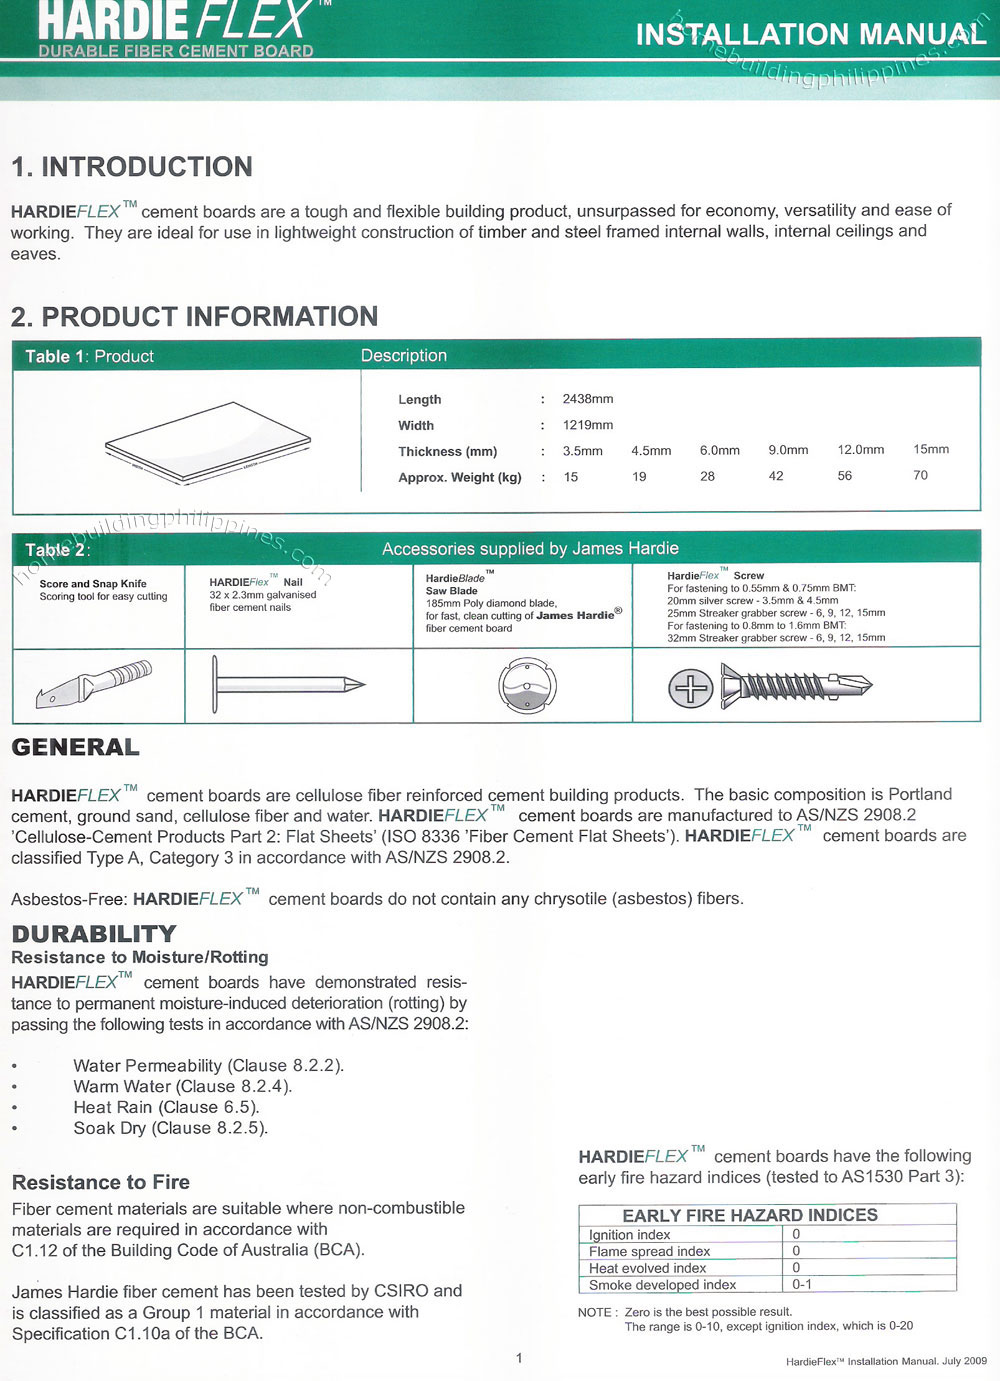 Hardieflex Durable Fiber Cement Board Installation Manual